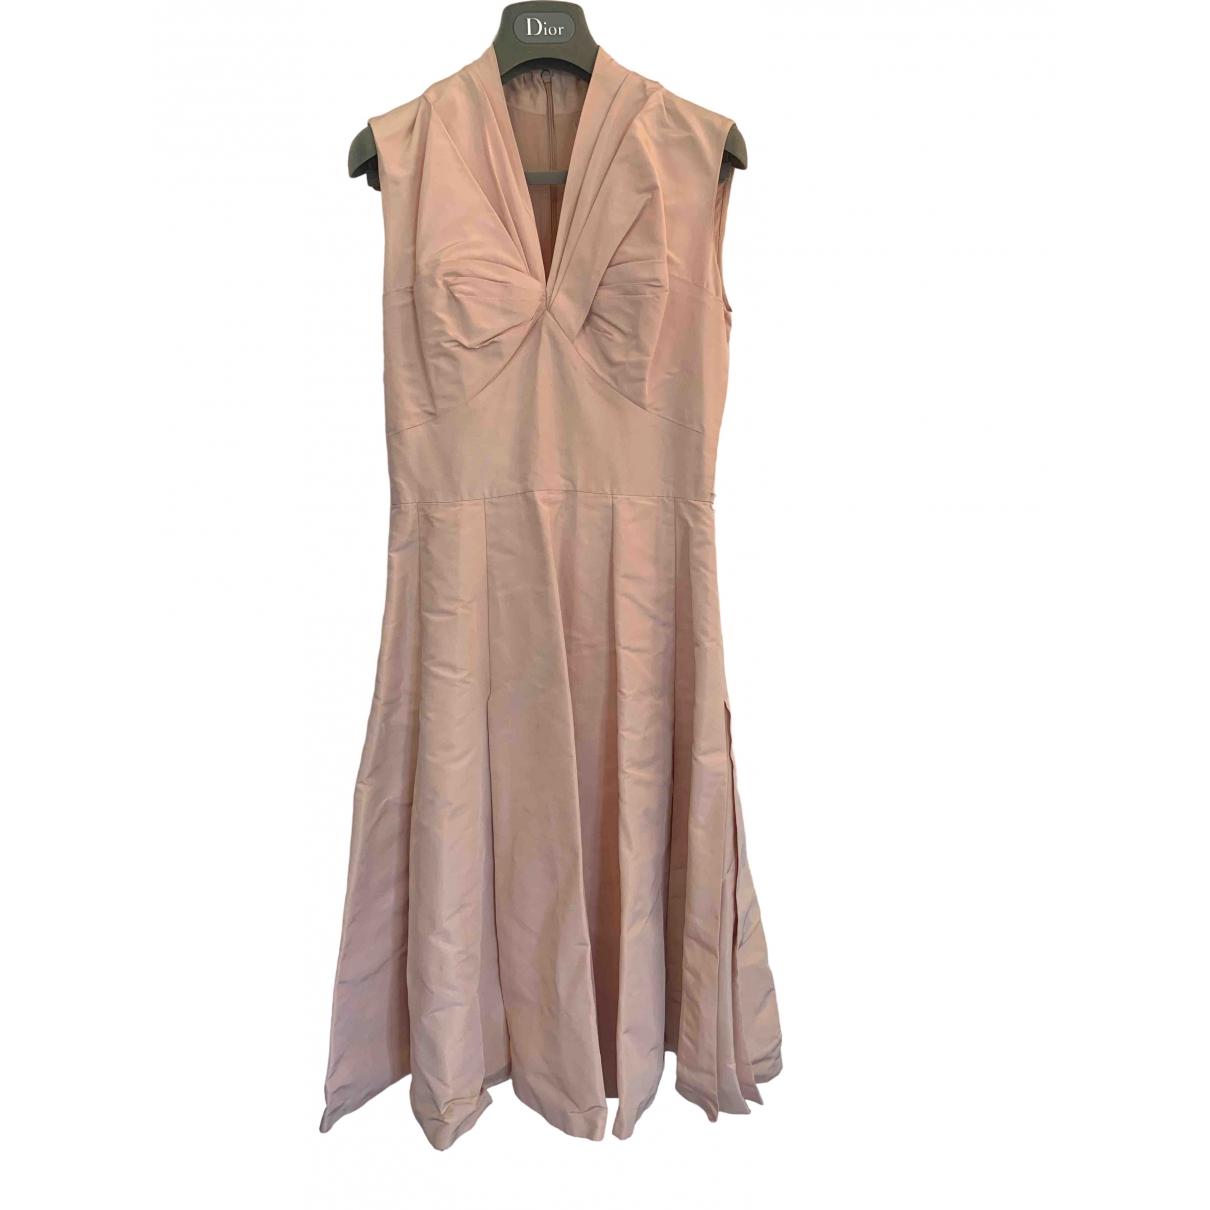 Dior \N Pink Silk dress for Women 36 FR